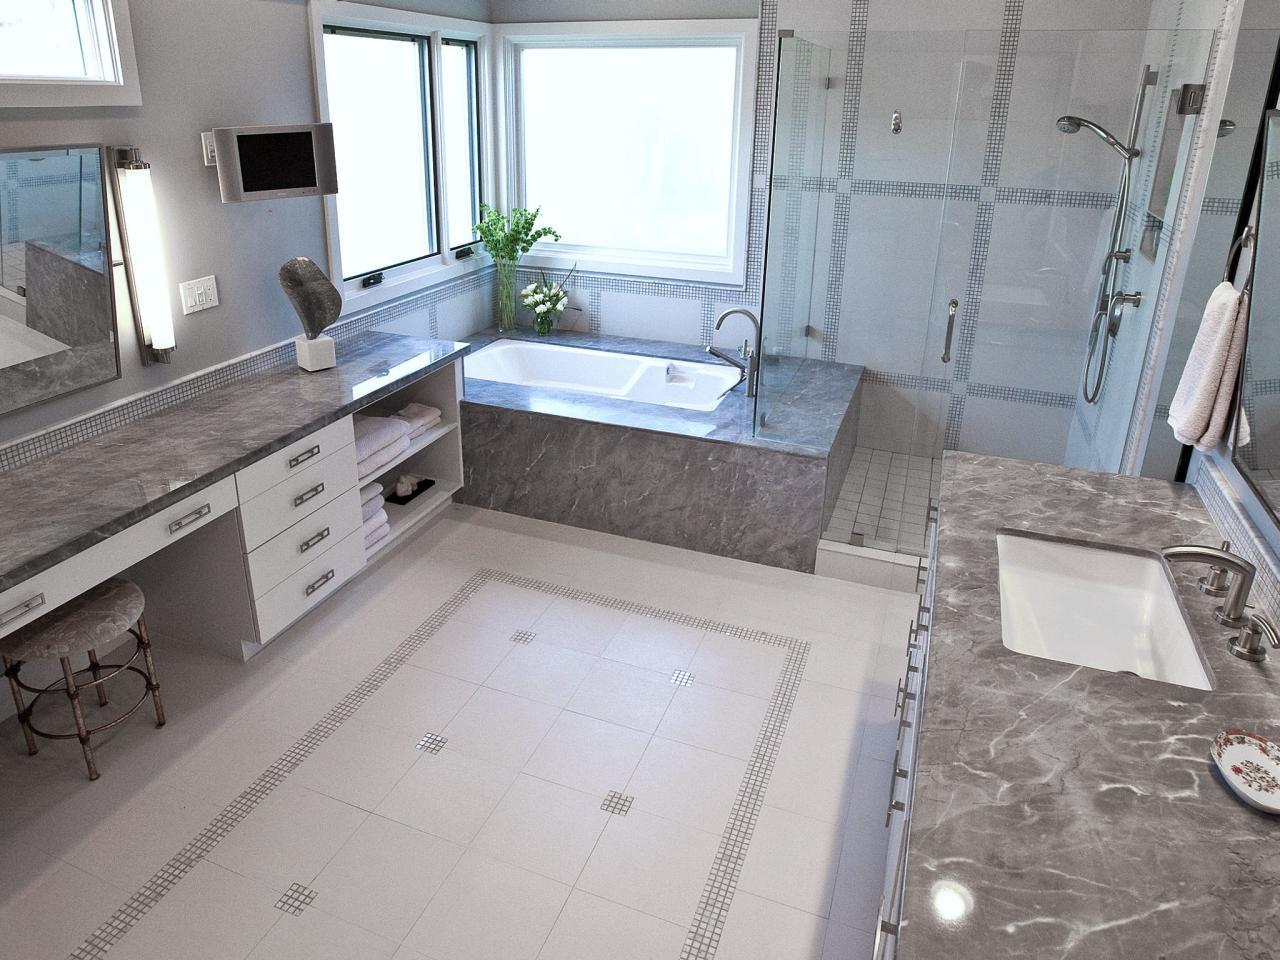 Artistic Glass Floor Tile Bathroom Of Clear Shower Room In Ing White